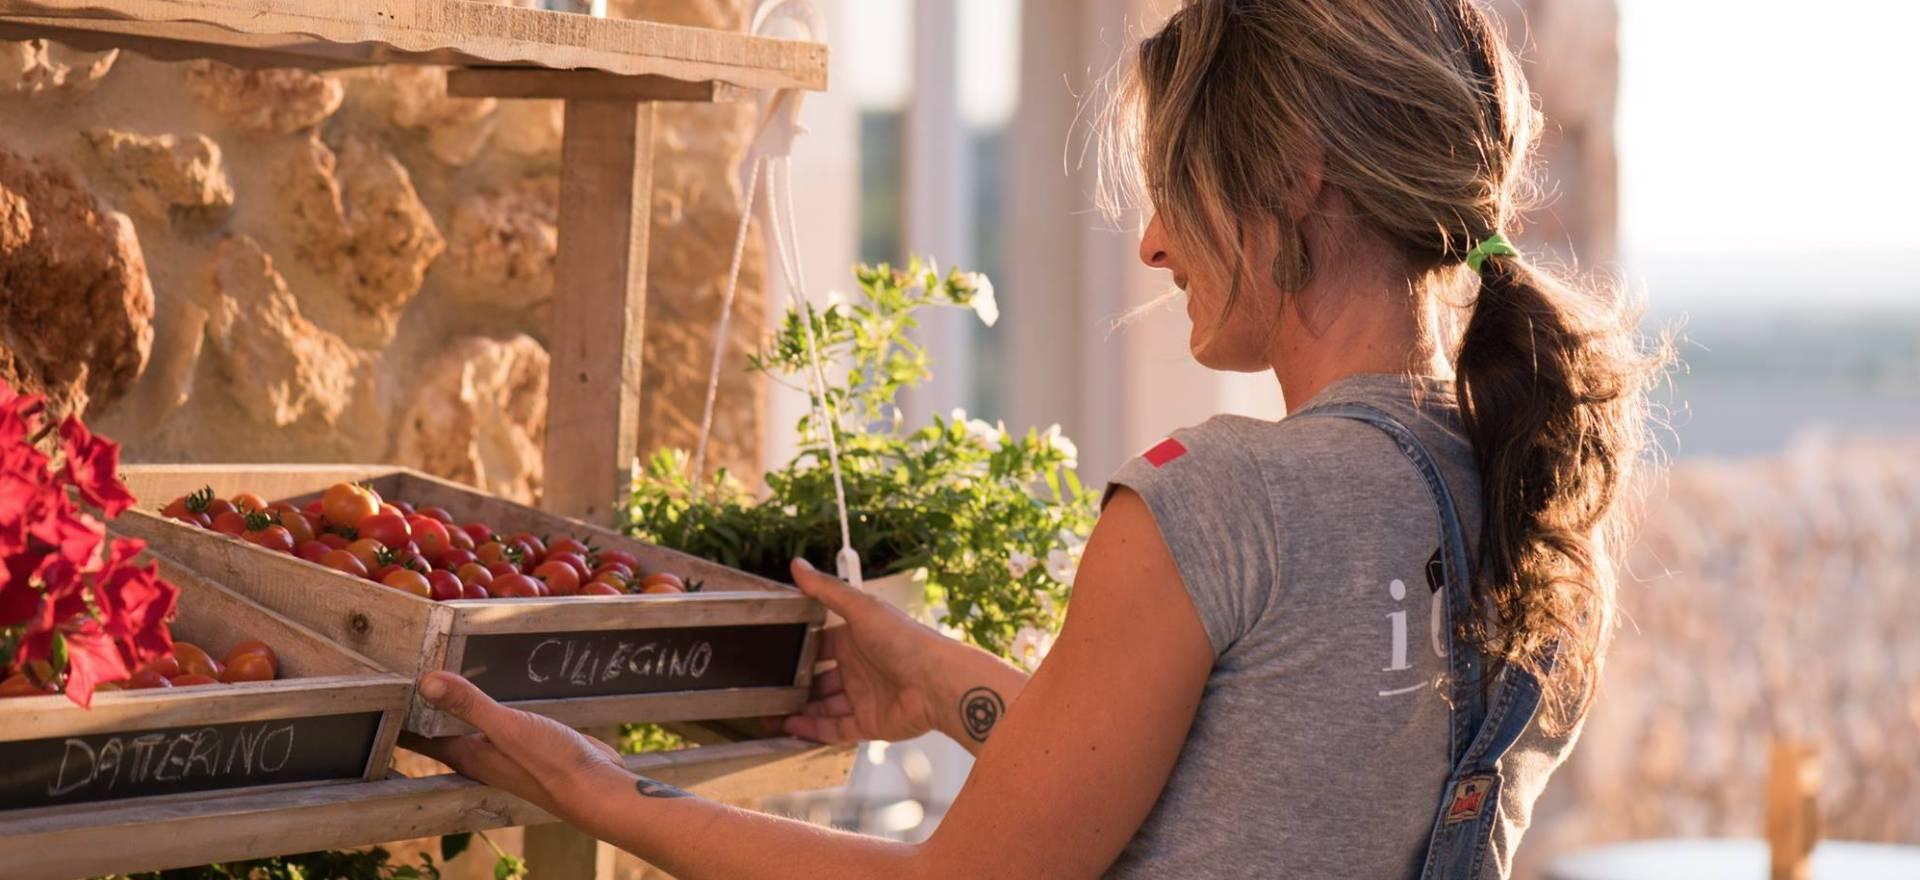 Agriturismo Sicily Organic agriturismo Sicily with sea view